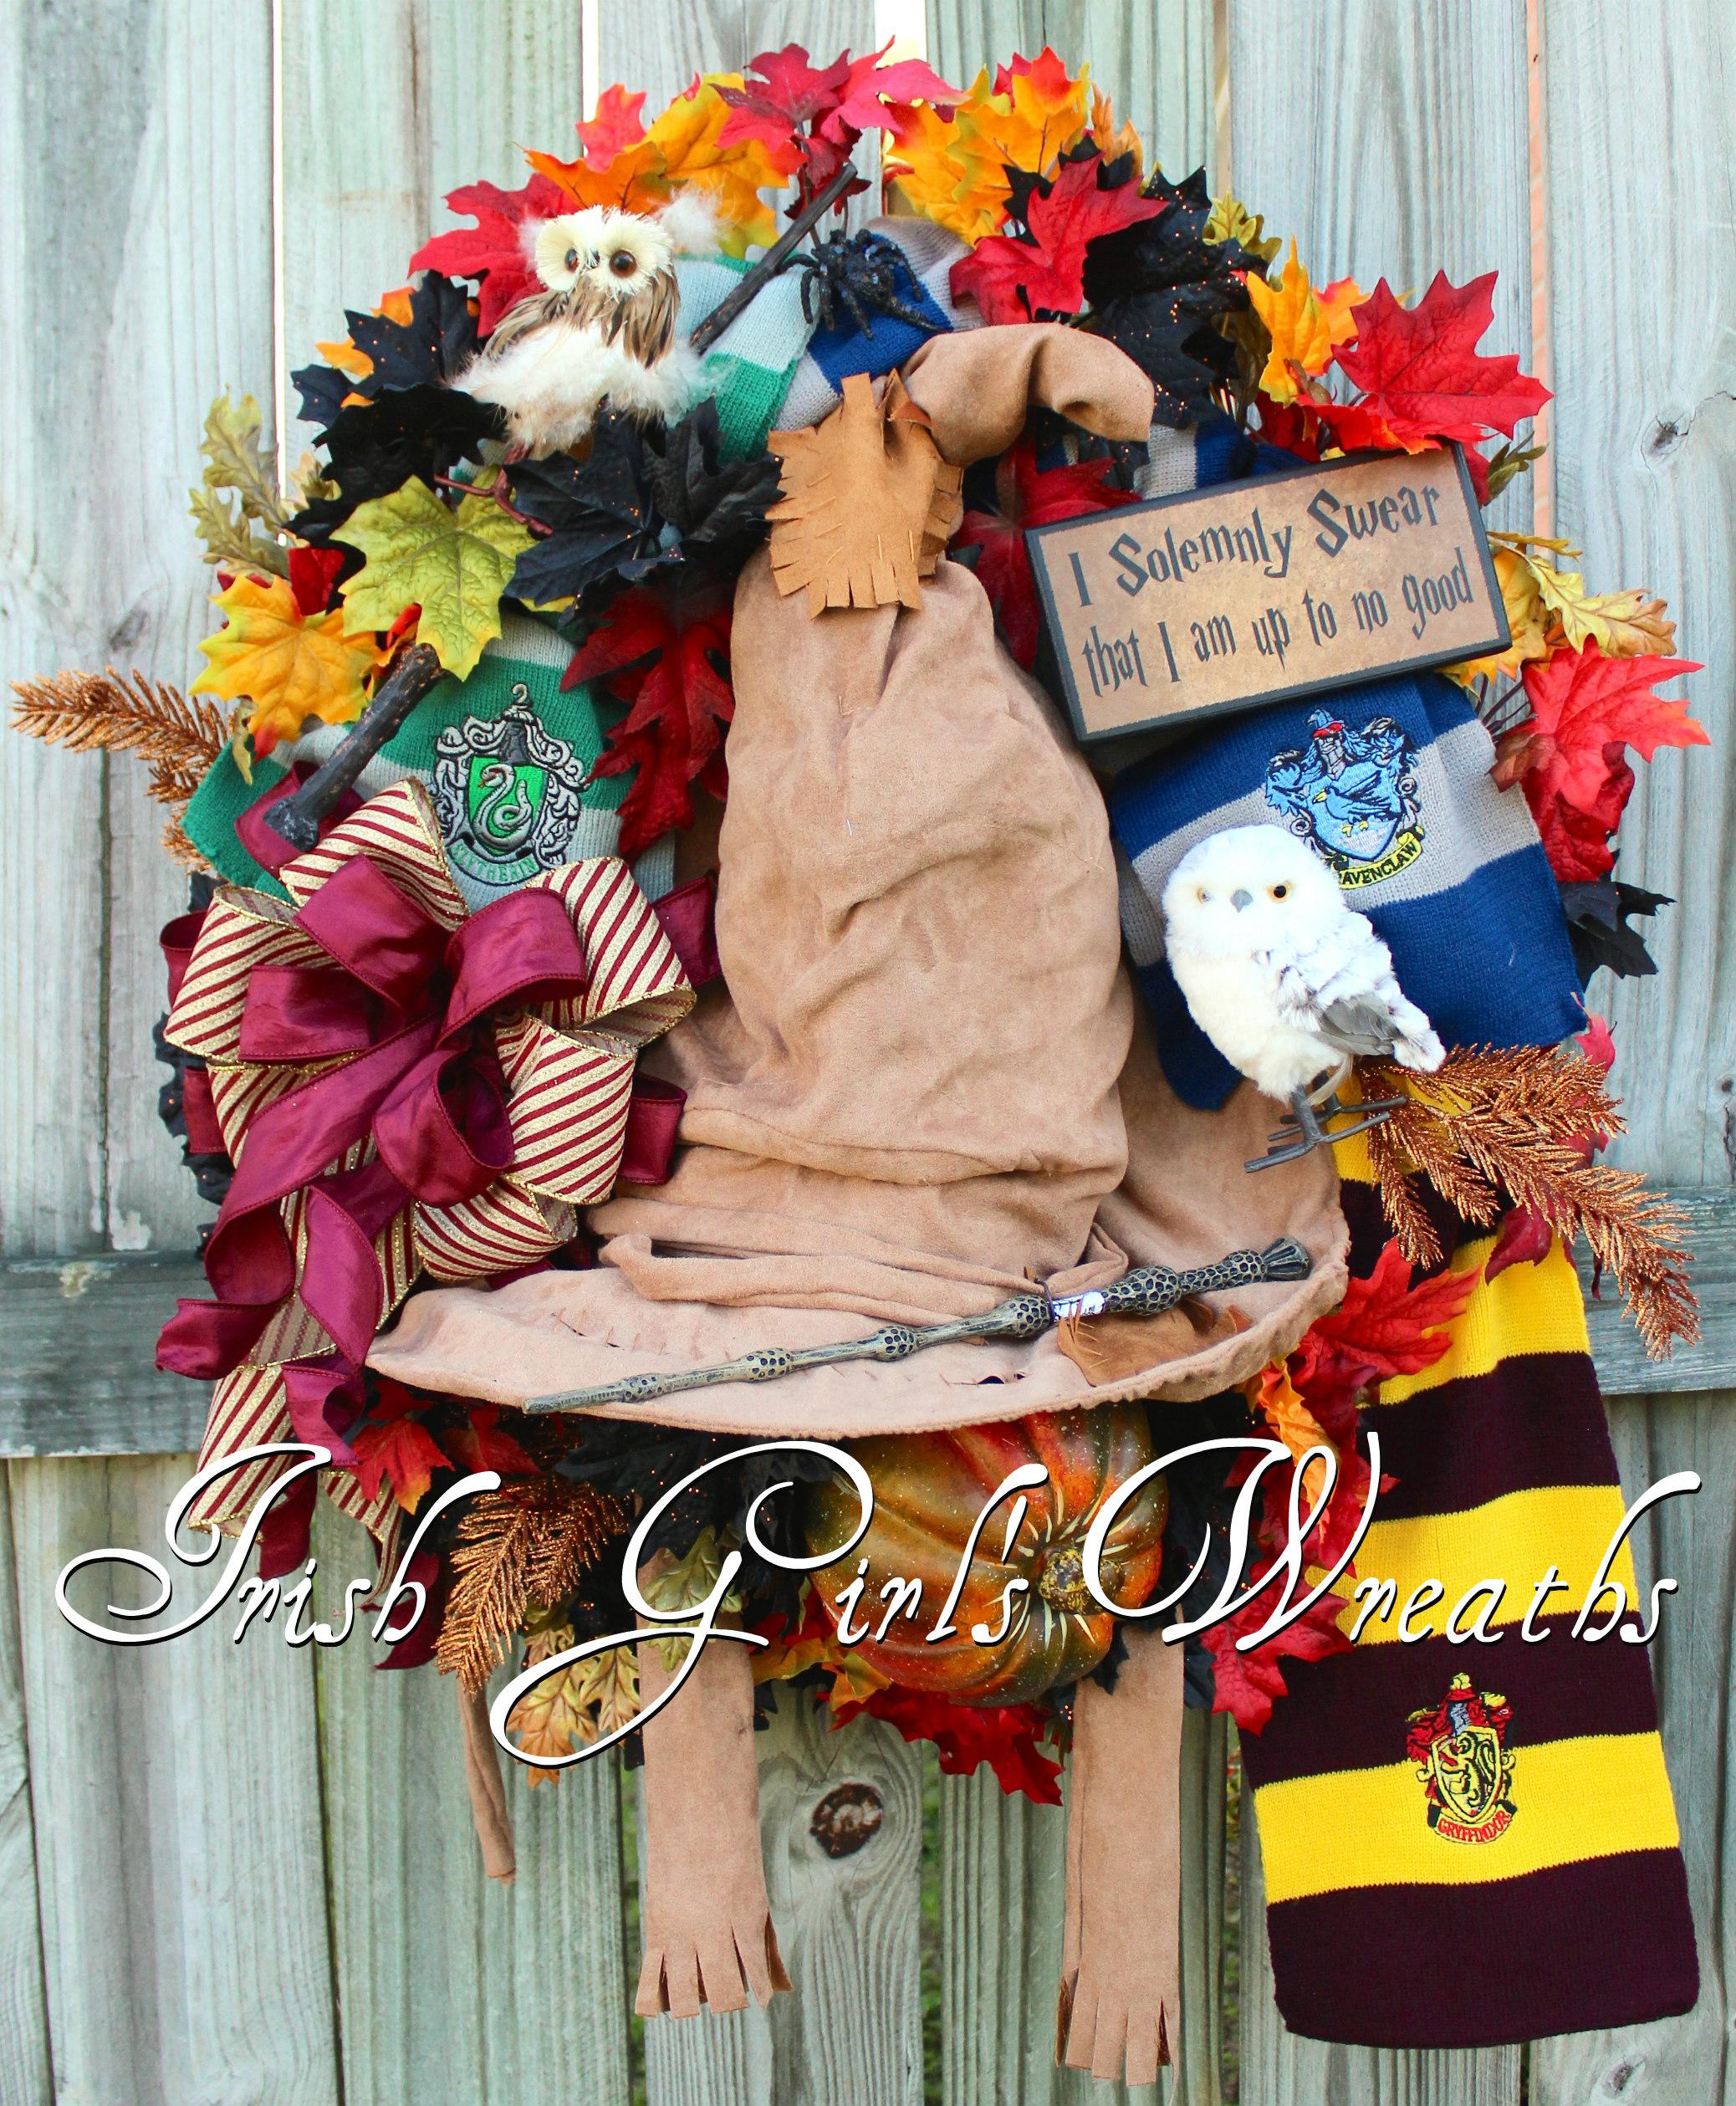 XL Hogwarts Harry Potter Sorting Hat Halloween Wreath, Gryffindor, Ravenclaw, Slytheryn, Owl, I Solemnly Swear I'm Up to No Good